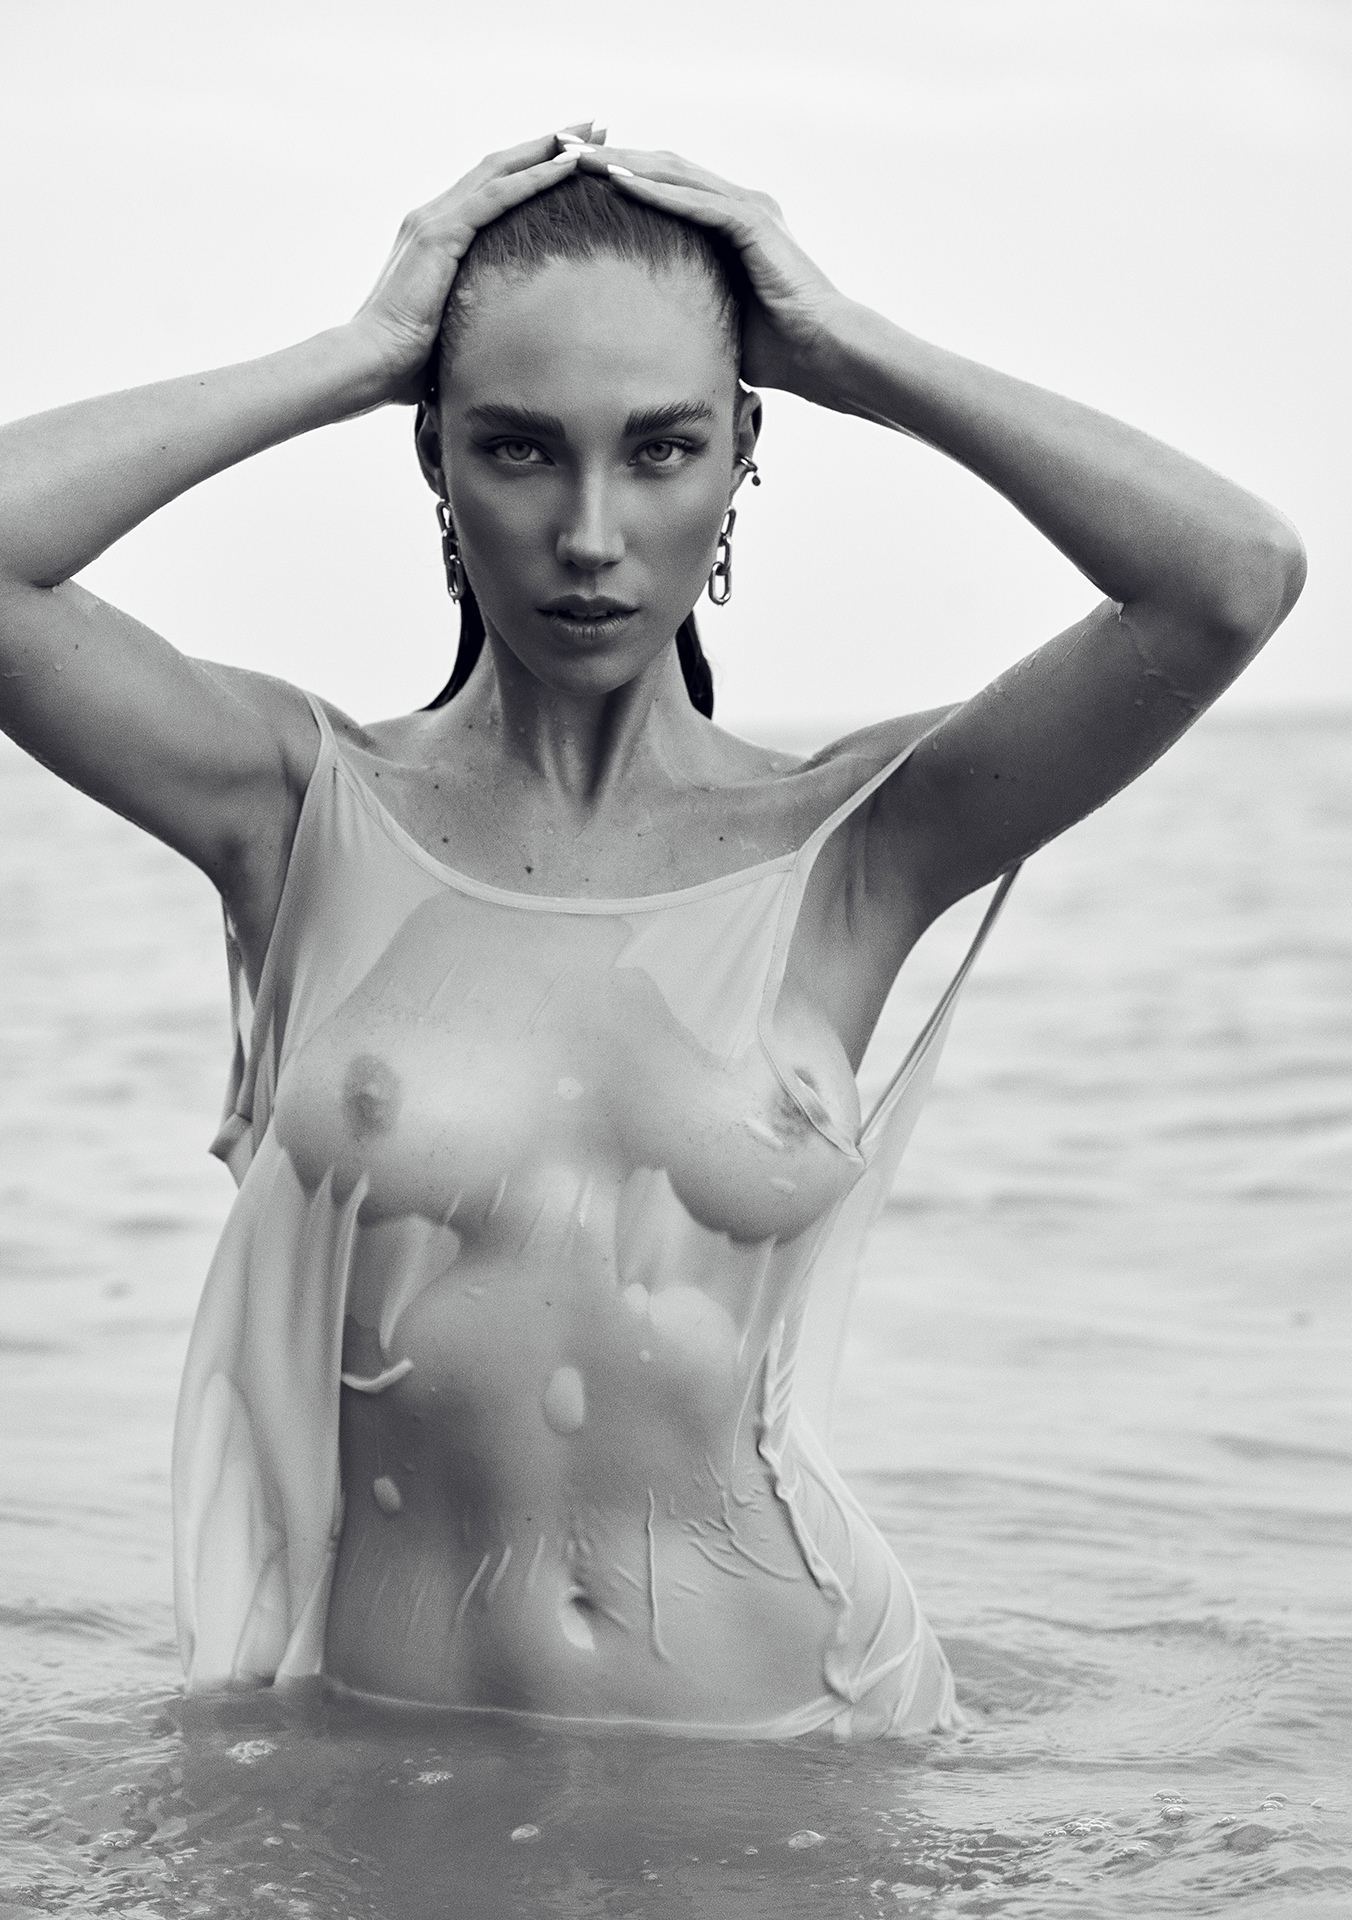 https://www.youngfolks.ru/pub/model-vasilisa-tyutneva-photographer-roman-filippov